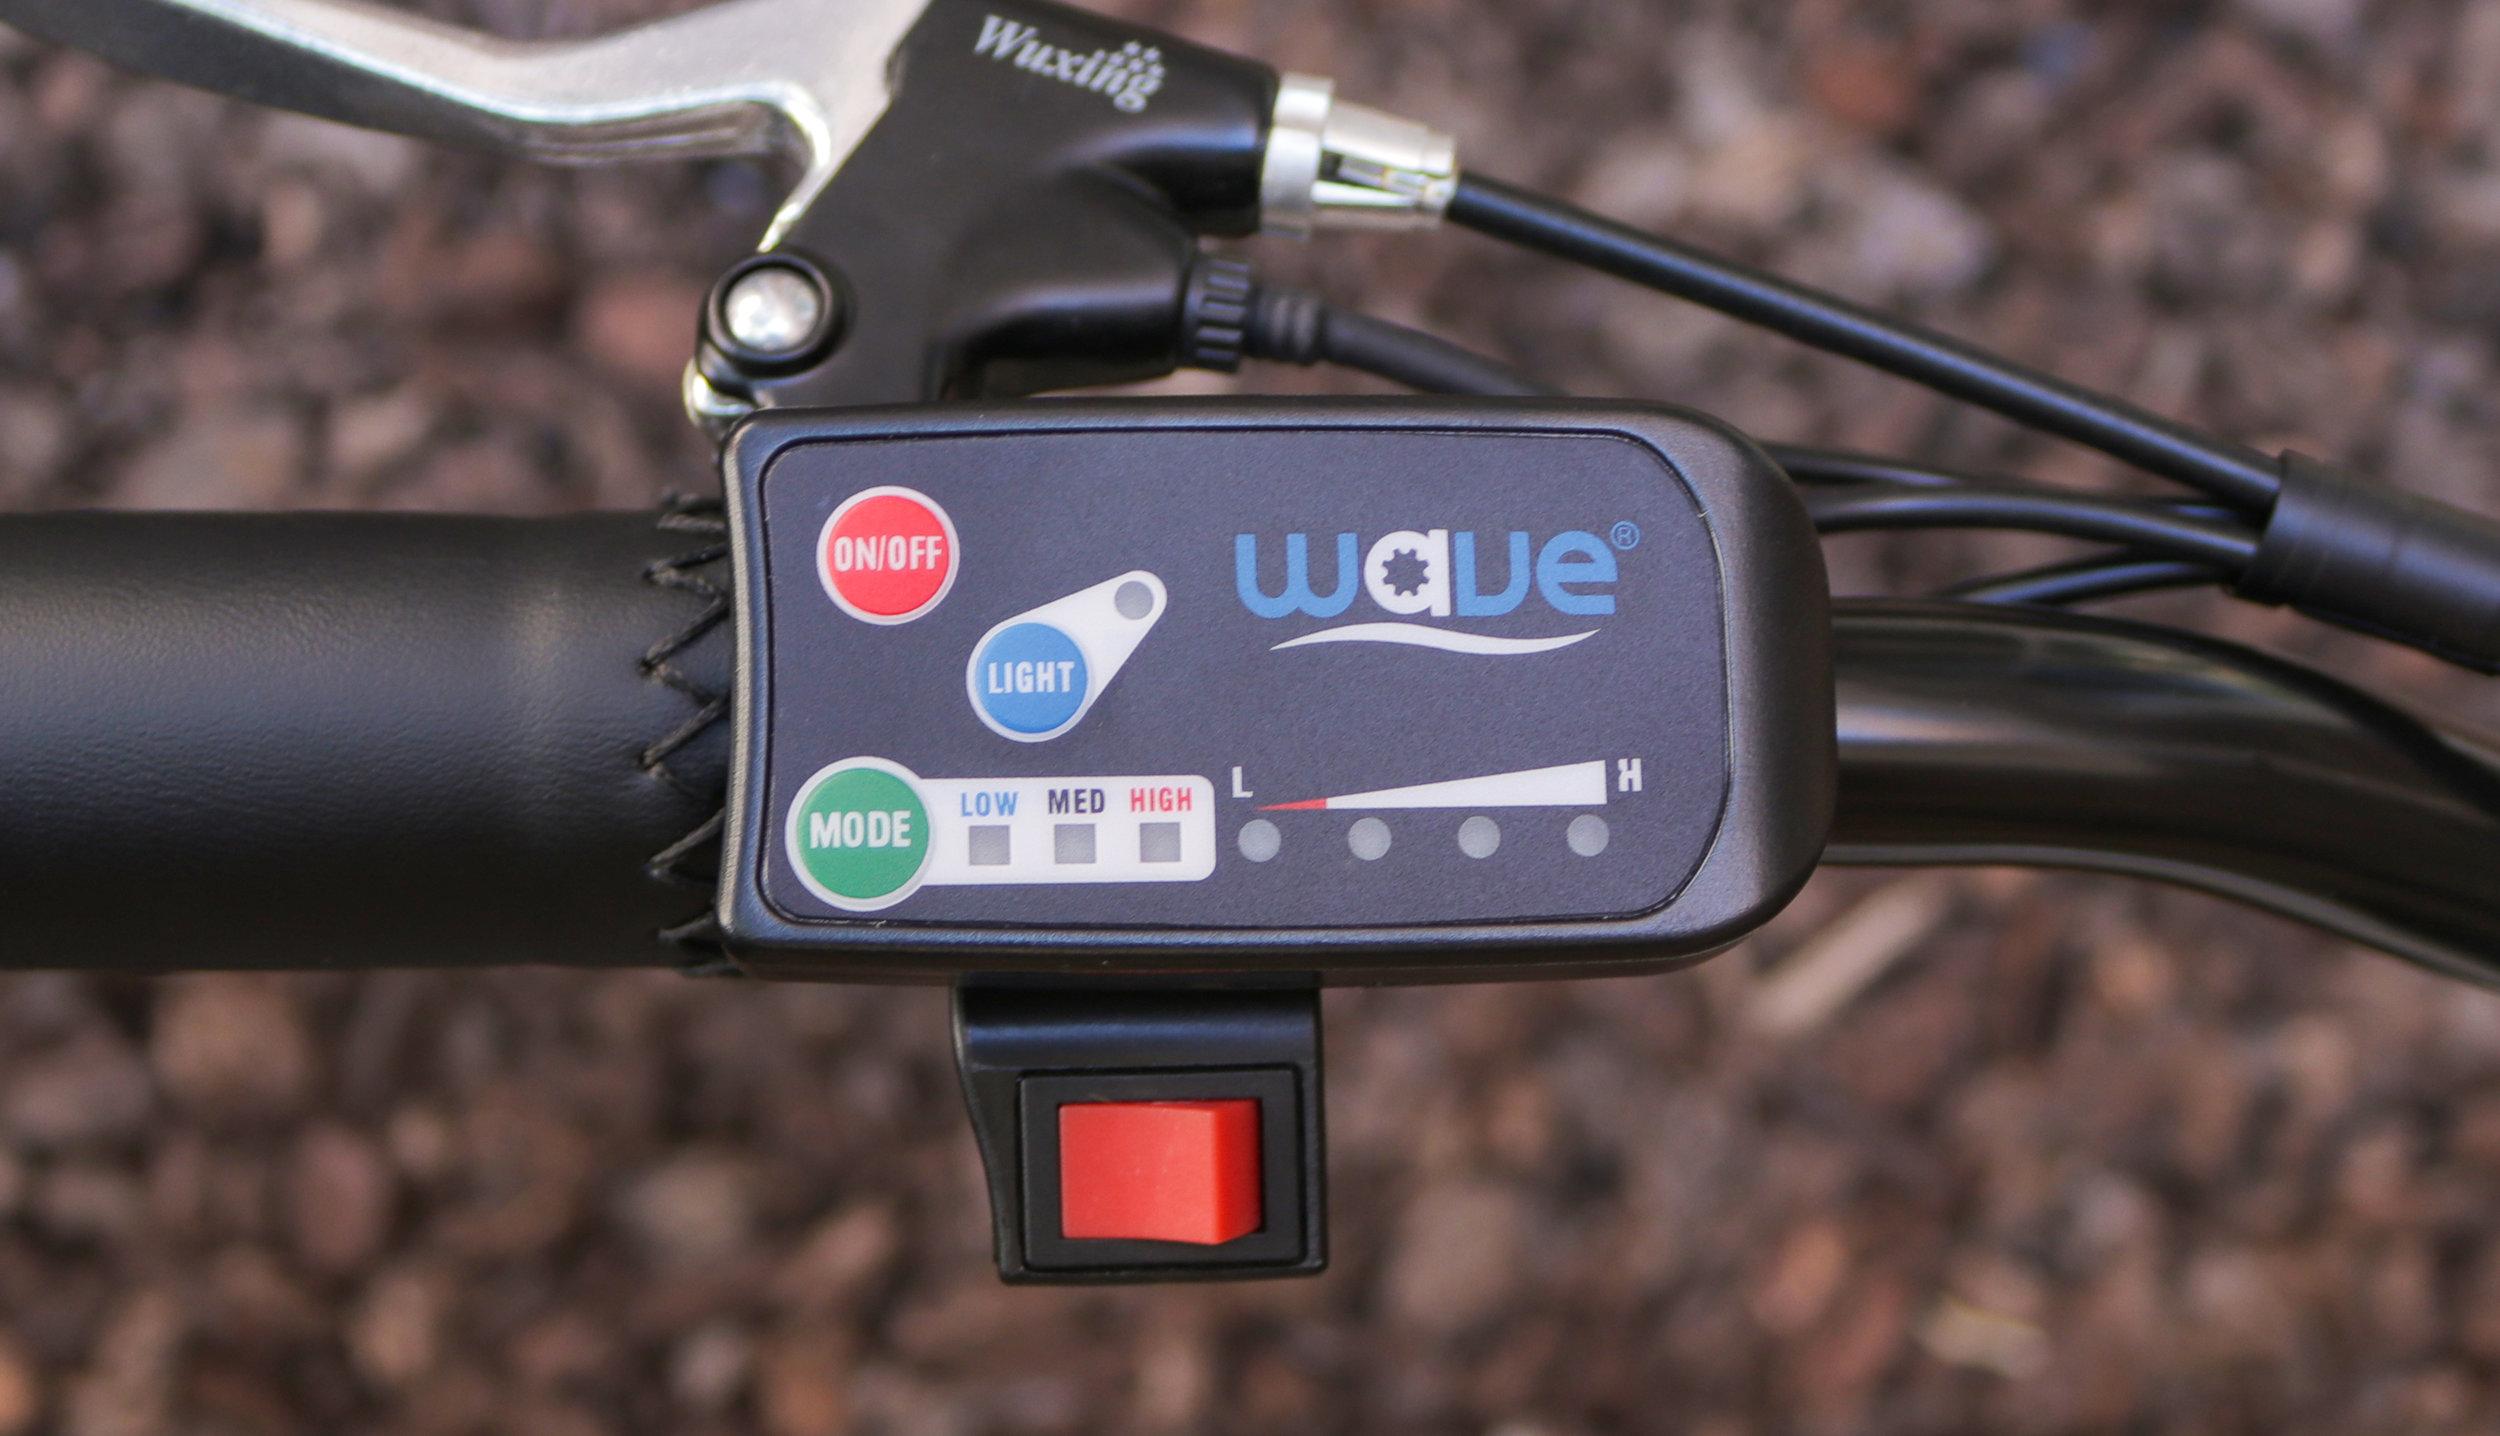 electrified-reviews-wave-electric-bike-review-display.jpg